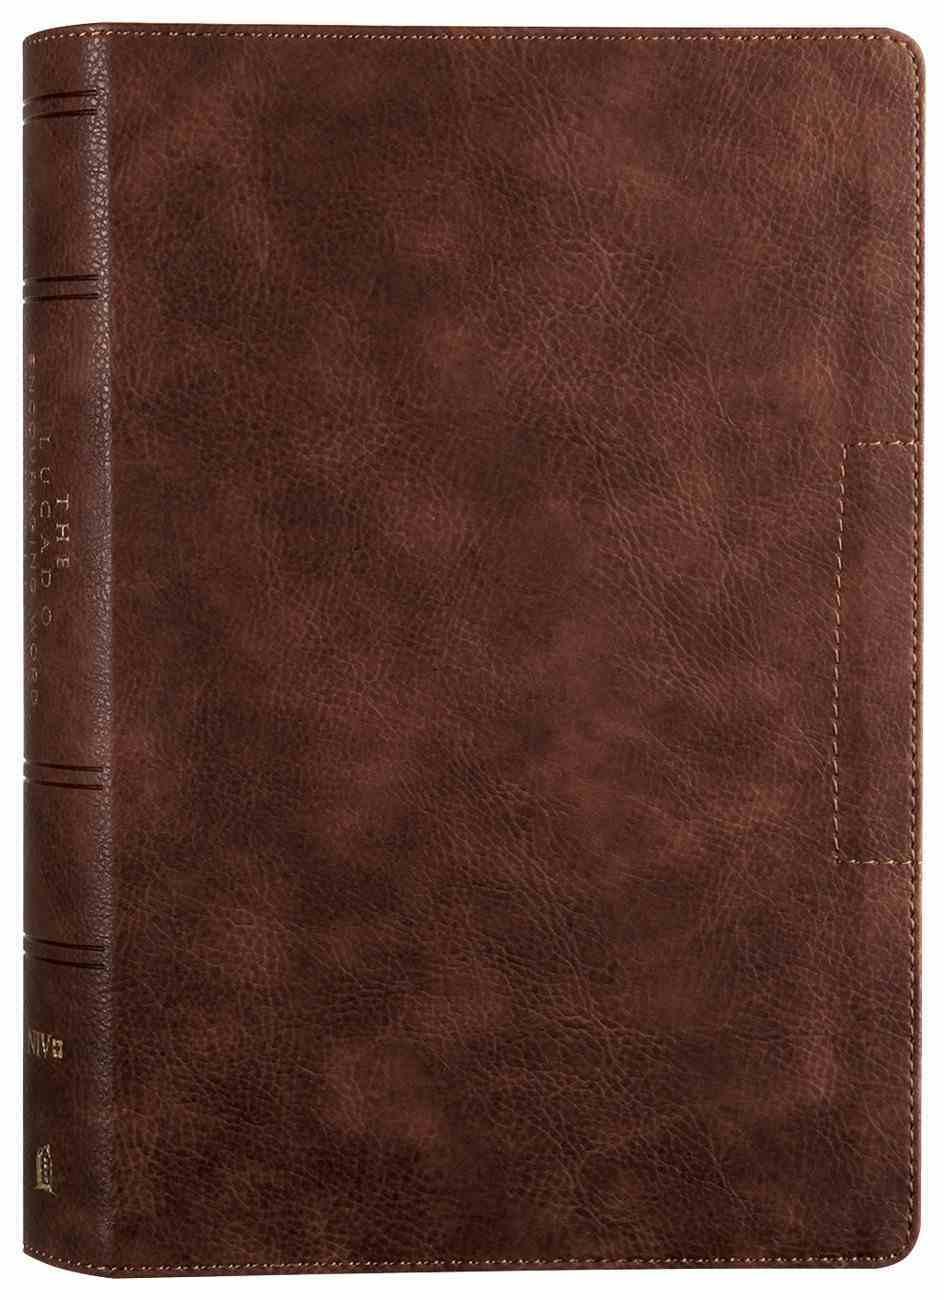 NIV Lucado Encouraging Word Bible Brown Premium Imitation Leather